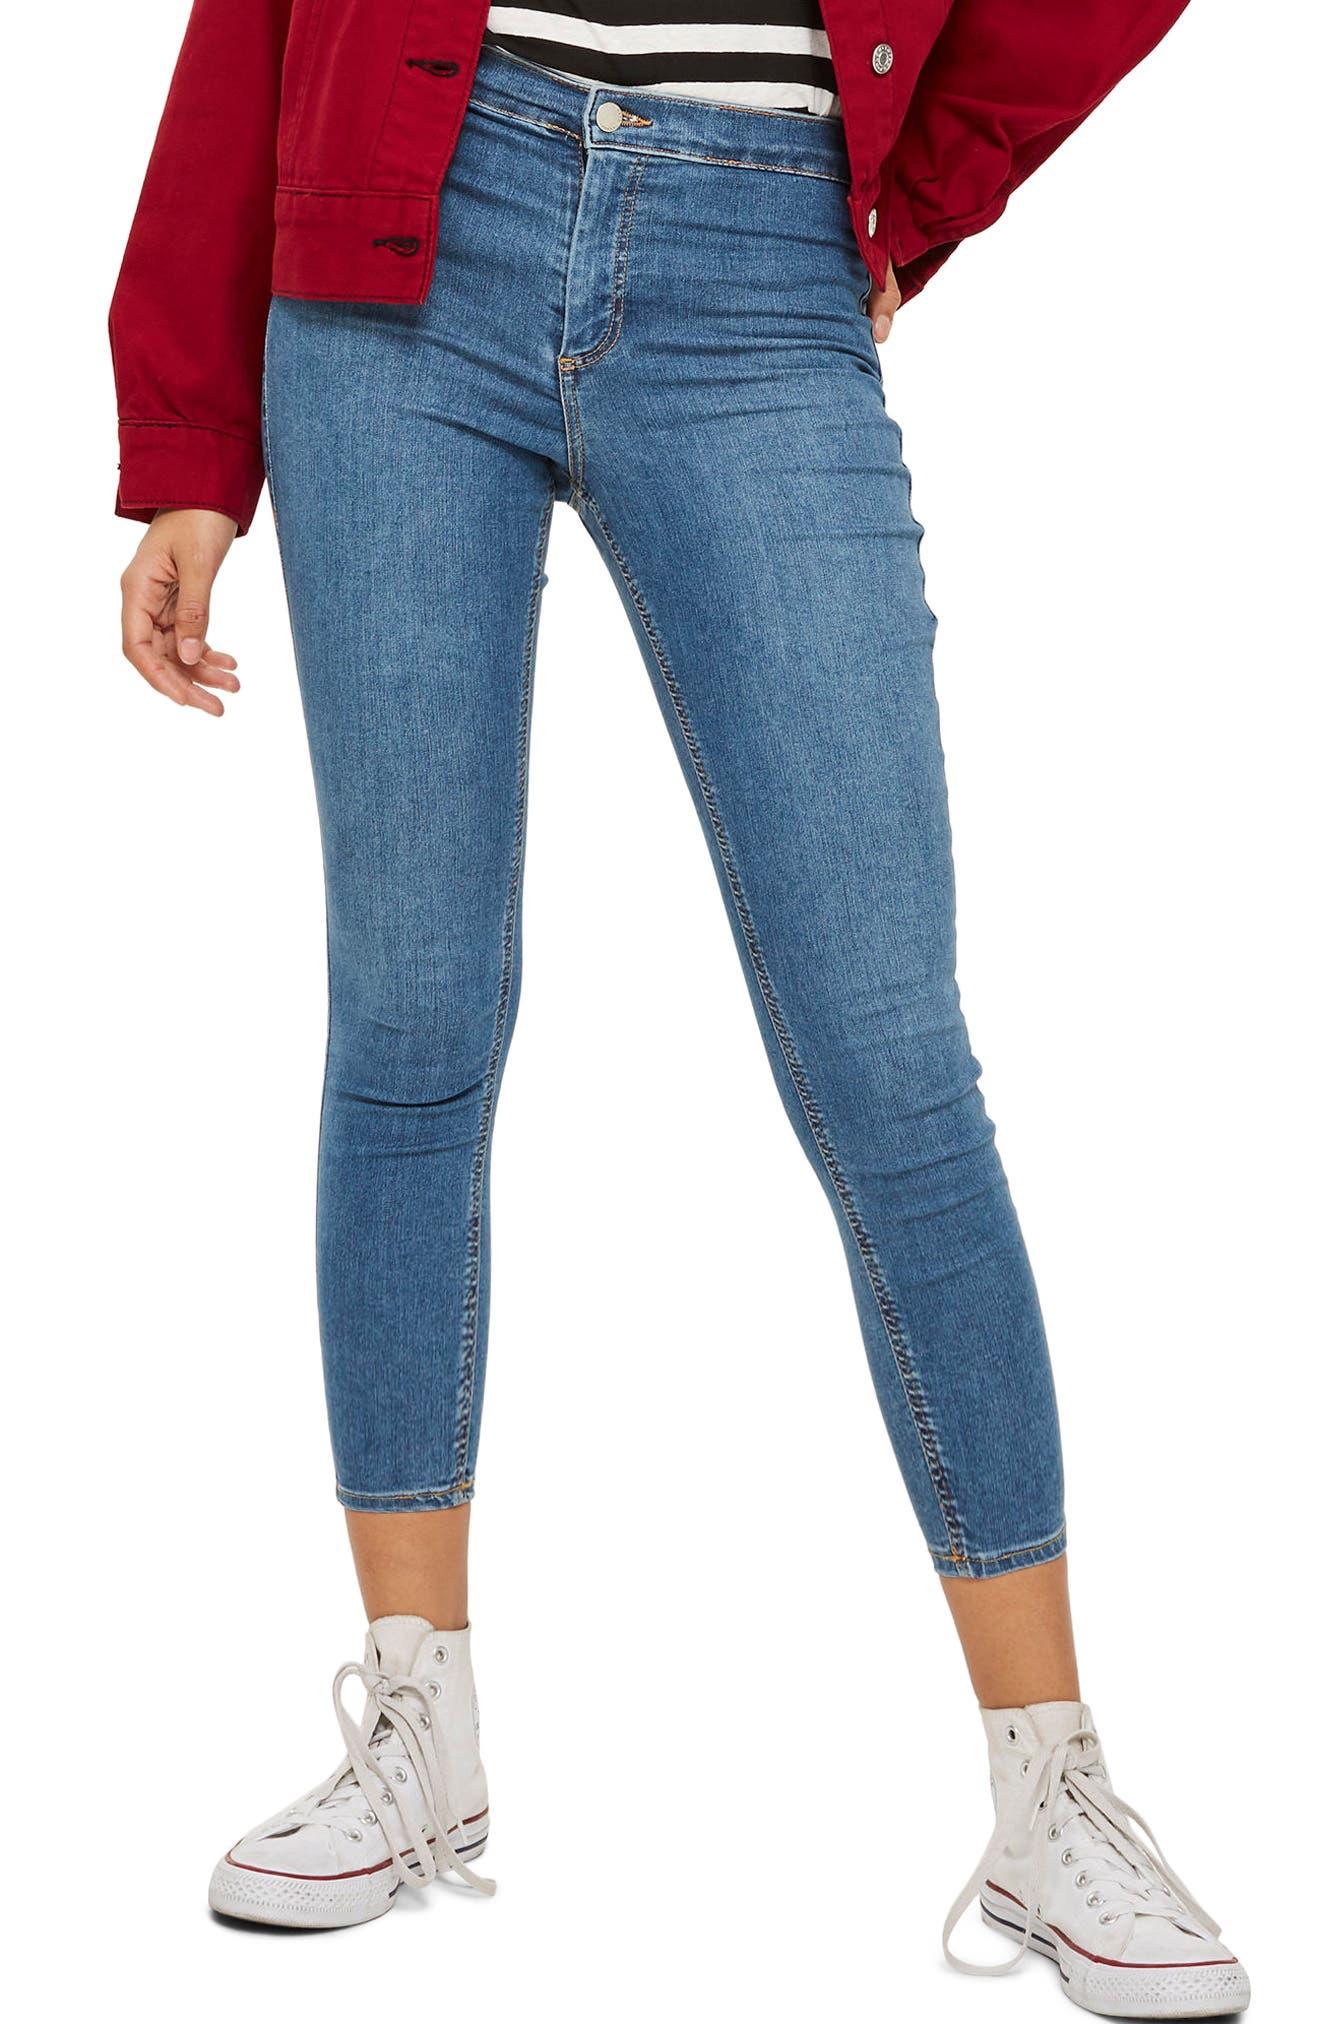 Joni Skinny Jeans,                         Main,                         color, MID DENIM